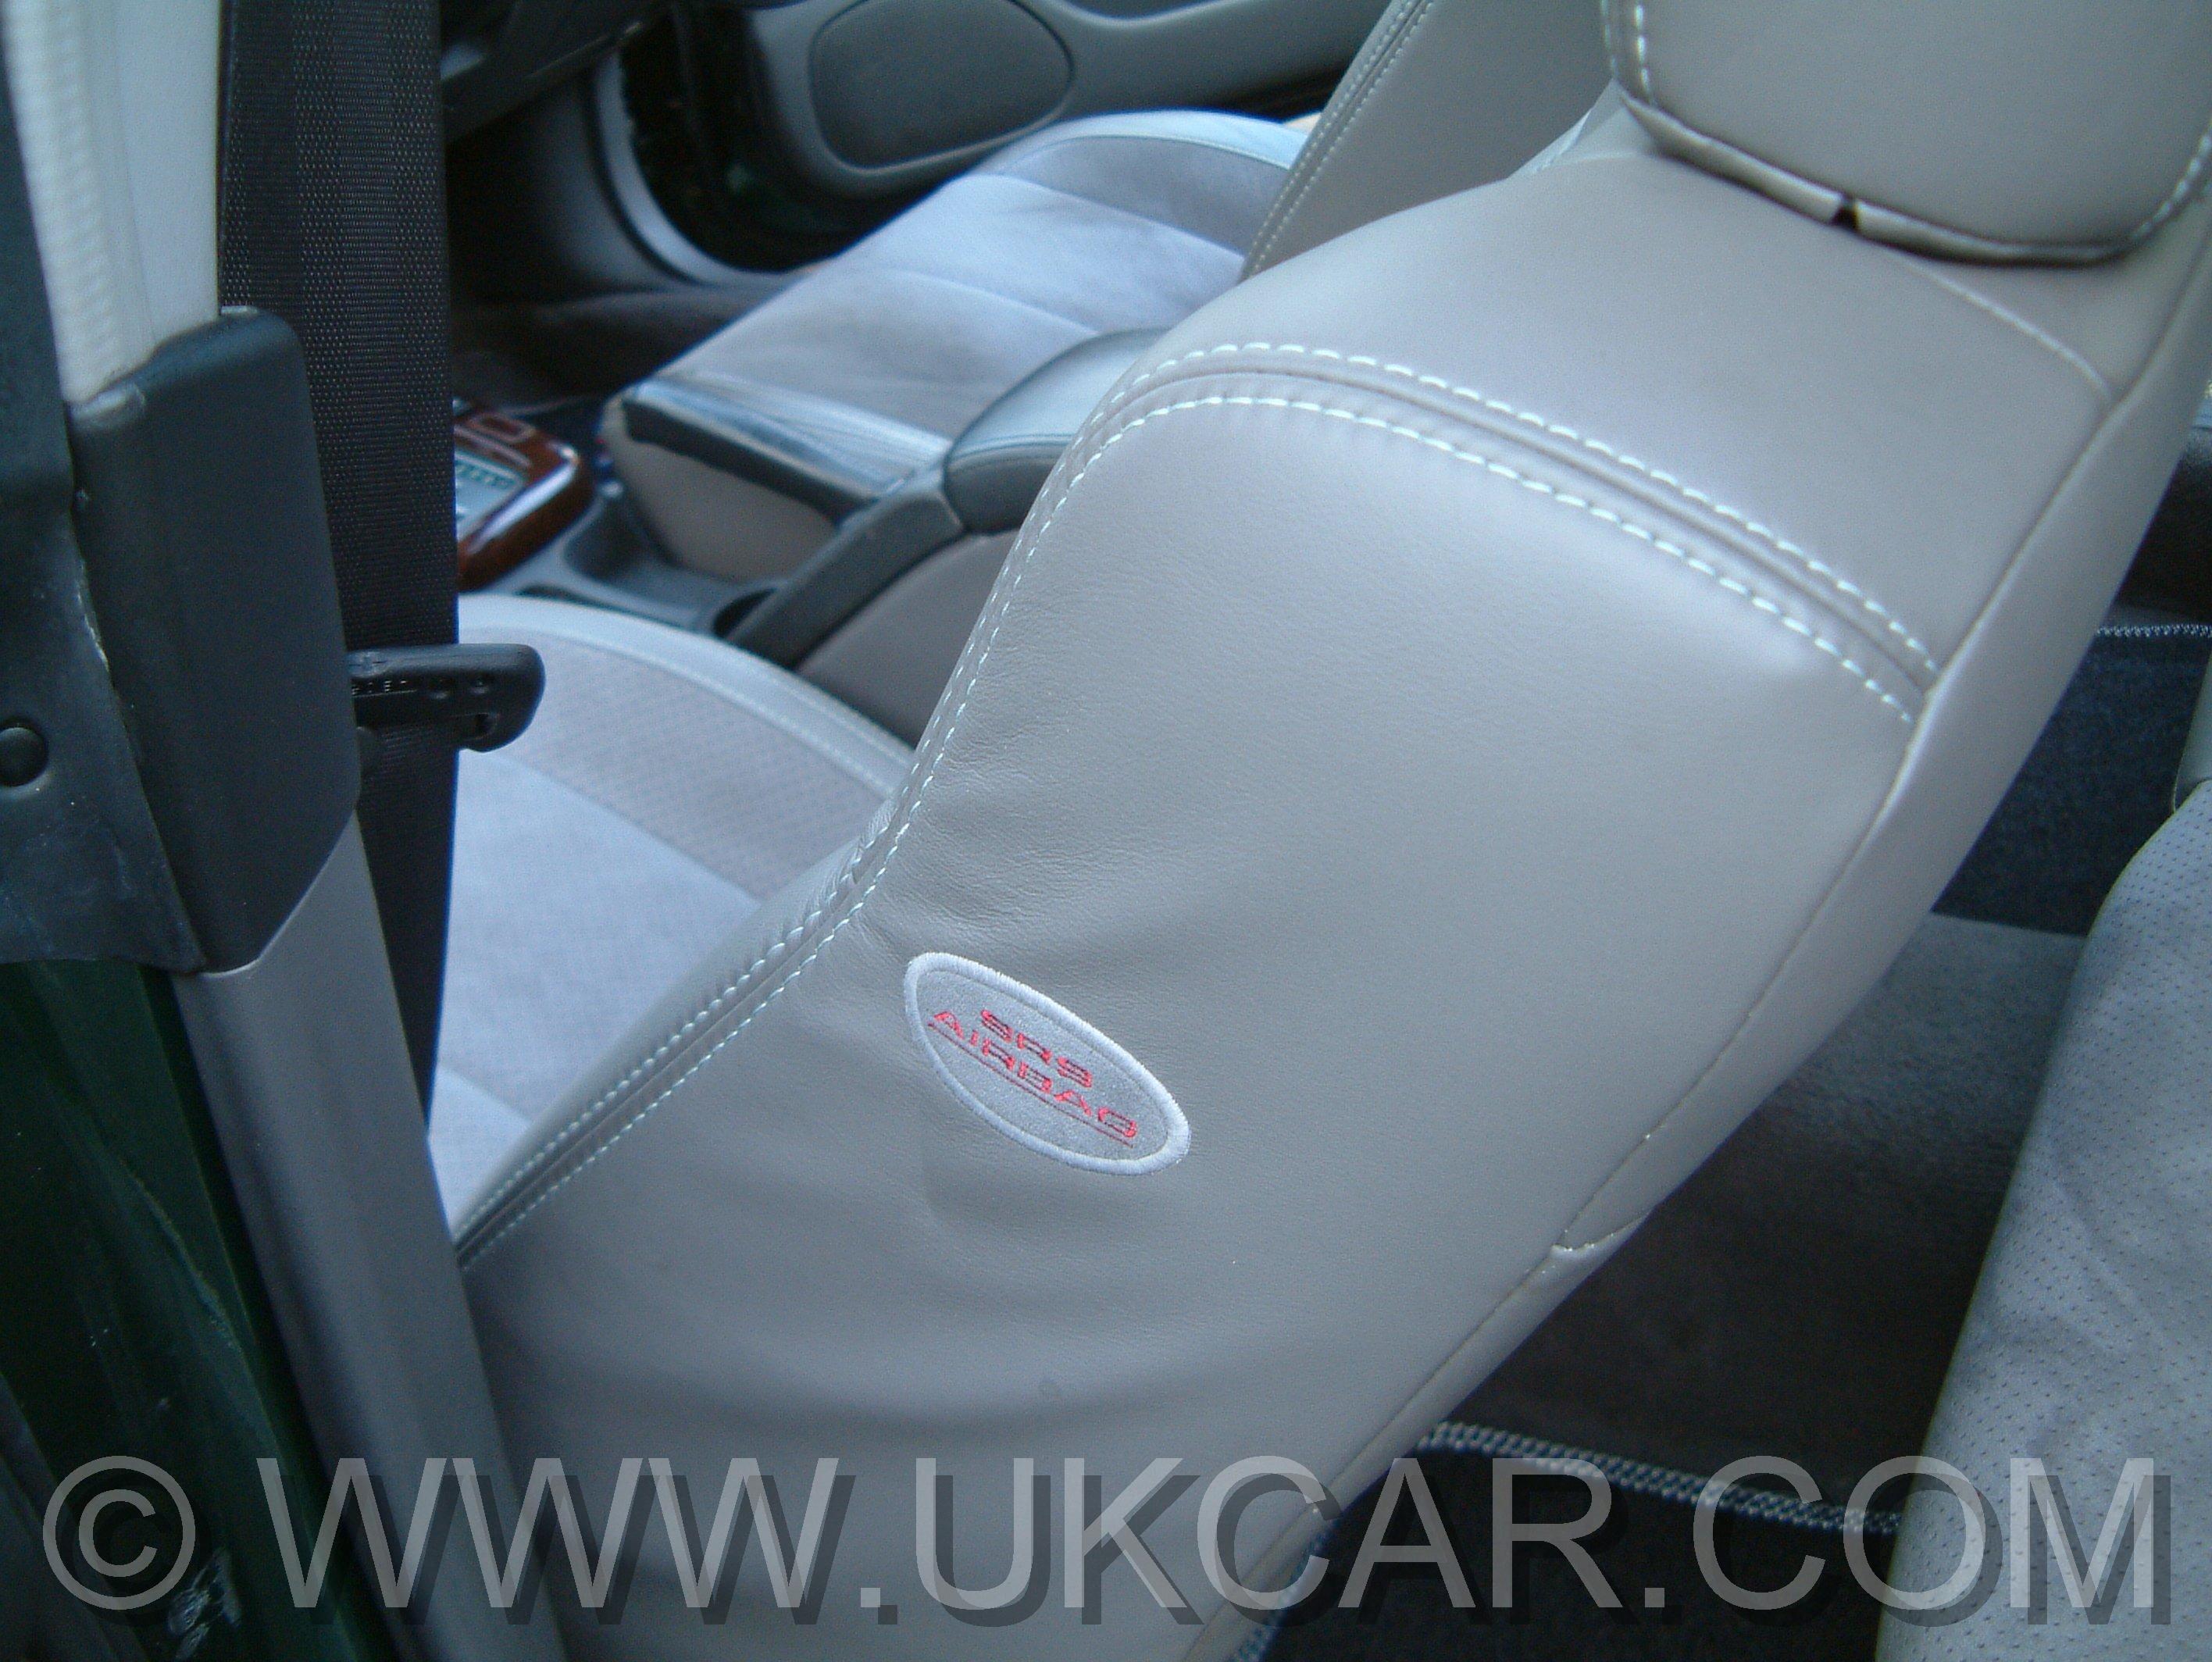 Subaru Legacy: Front seatbelts